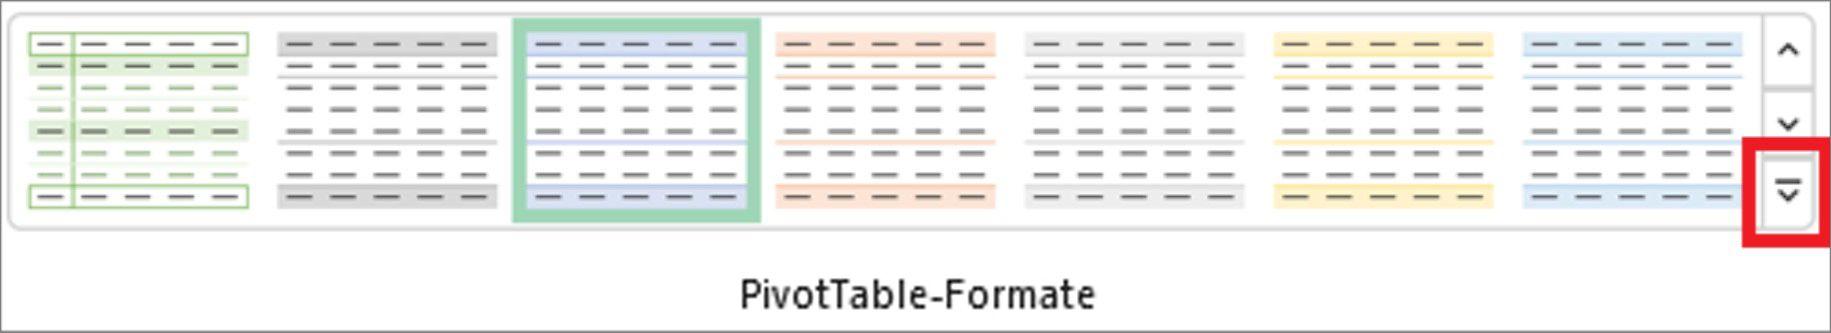 Abbildung des Excel-Menübands